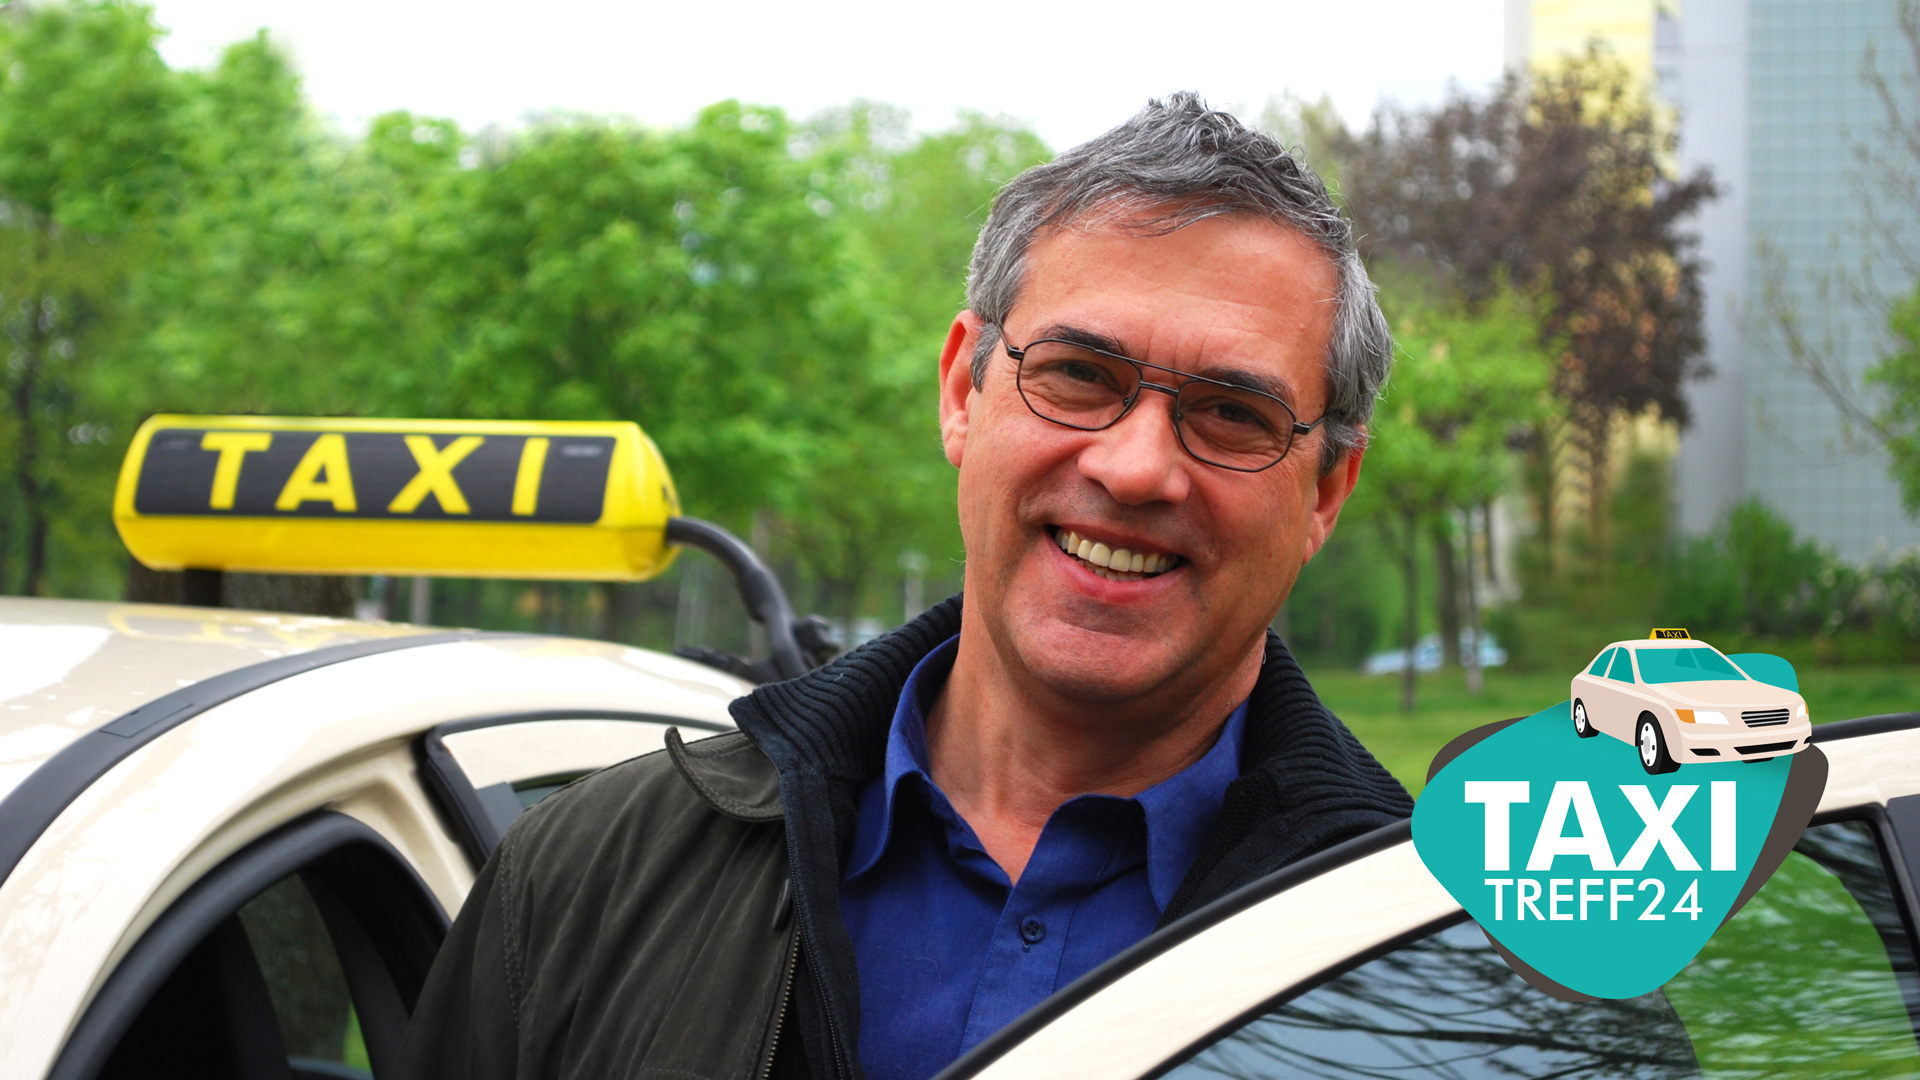 TaxifahrerIn in Kerpen-Horrem